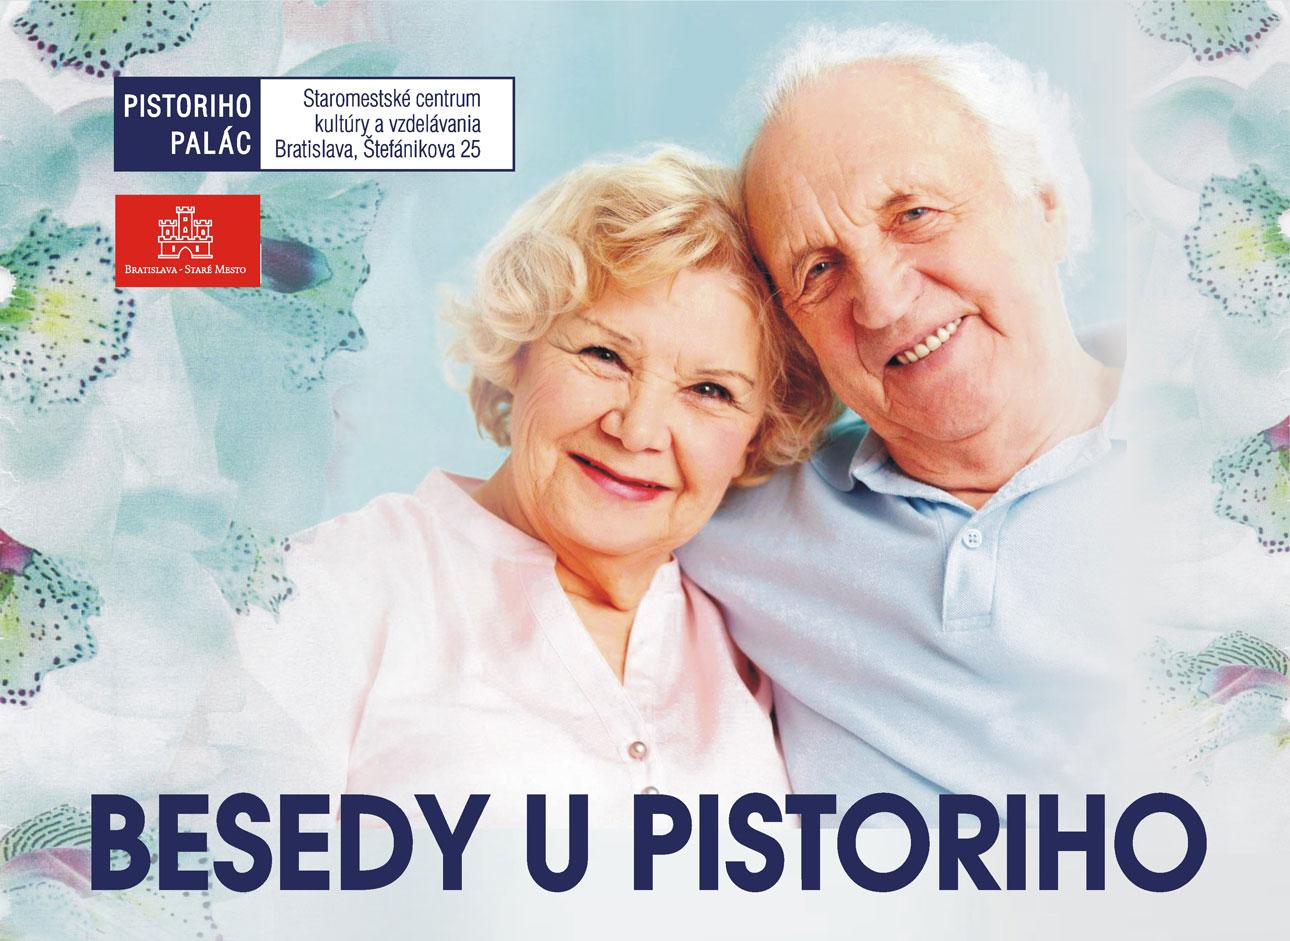 Besedy u Pistoriho